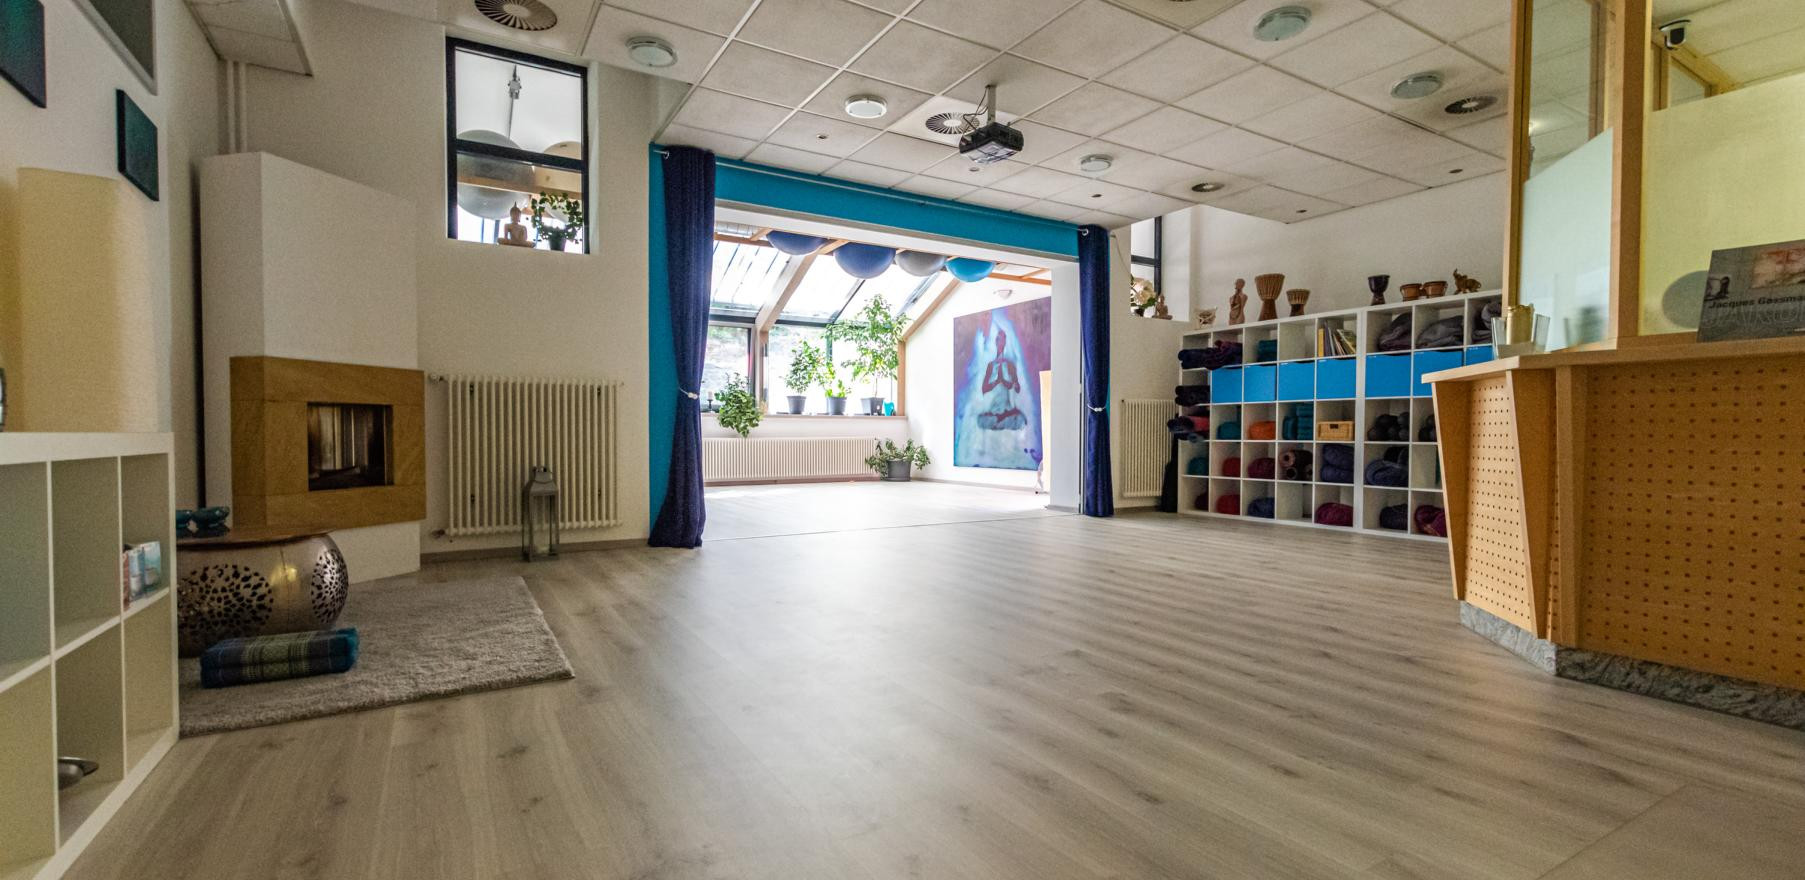 Yogastudio in Würzburg